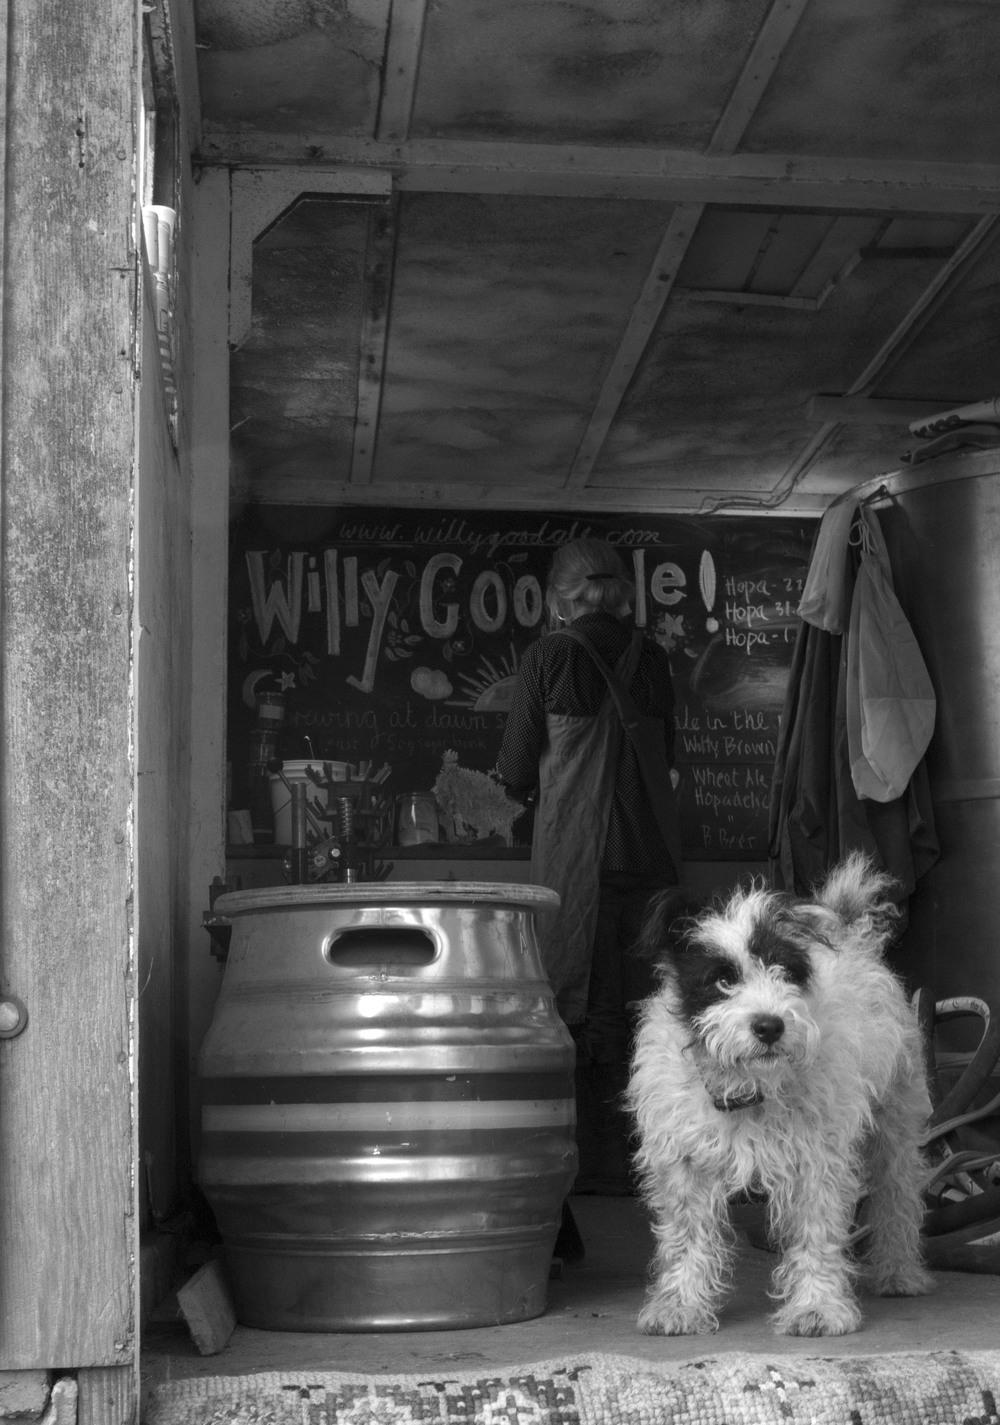 bath best local beer bradford-on-avon brewery wiltshire good ale